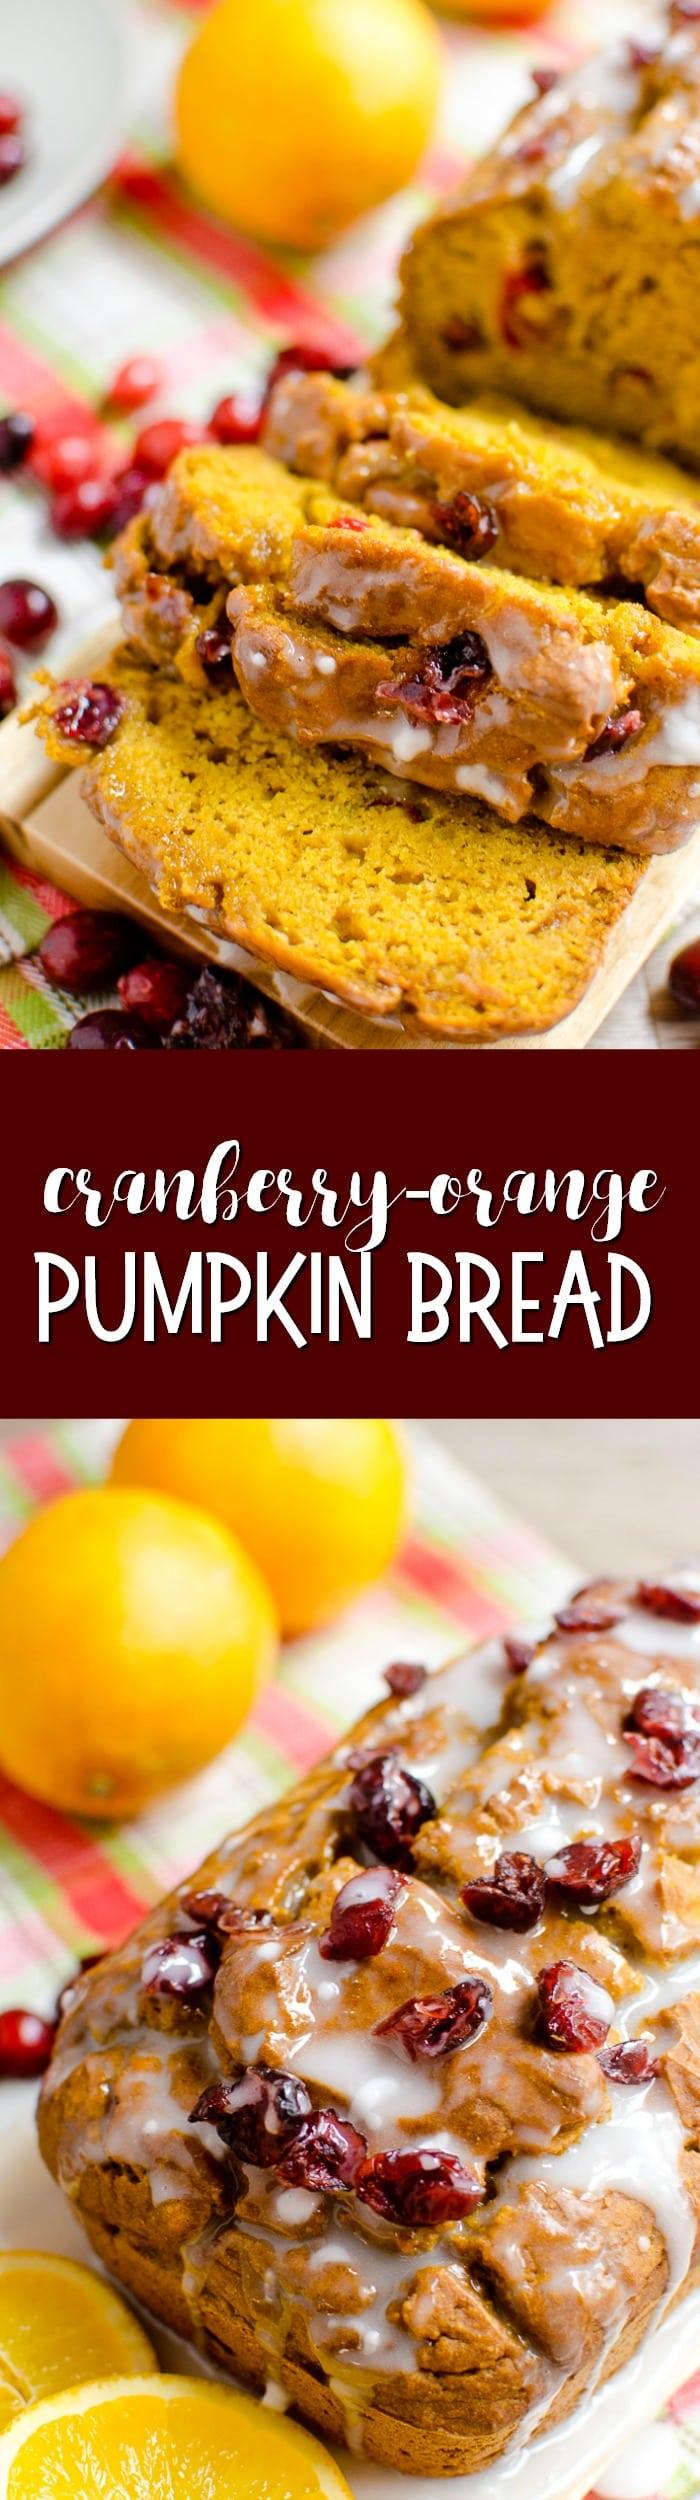 Cranberry-Orange Pumpkin Bread combines your favorite pumpkin-spiced pumpkin bread with a tart cranberry surprise!